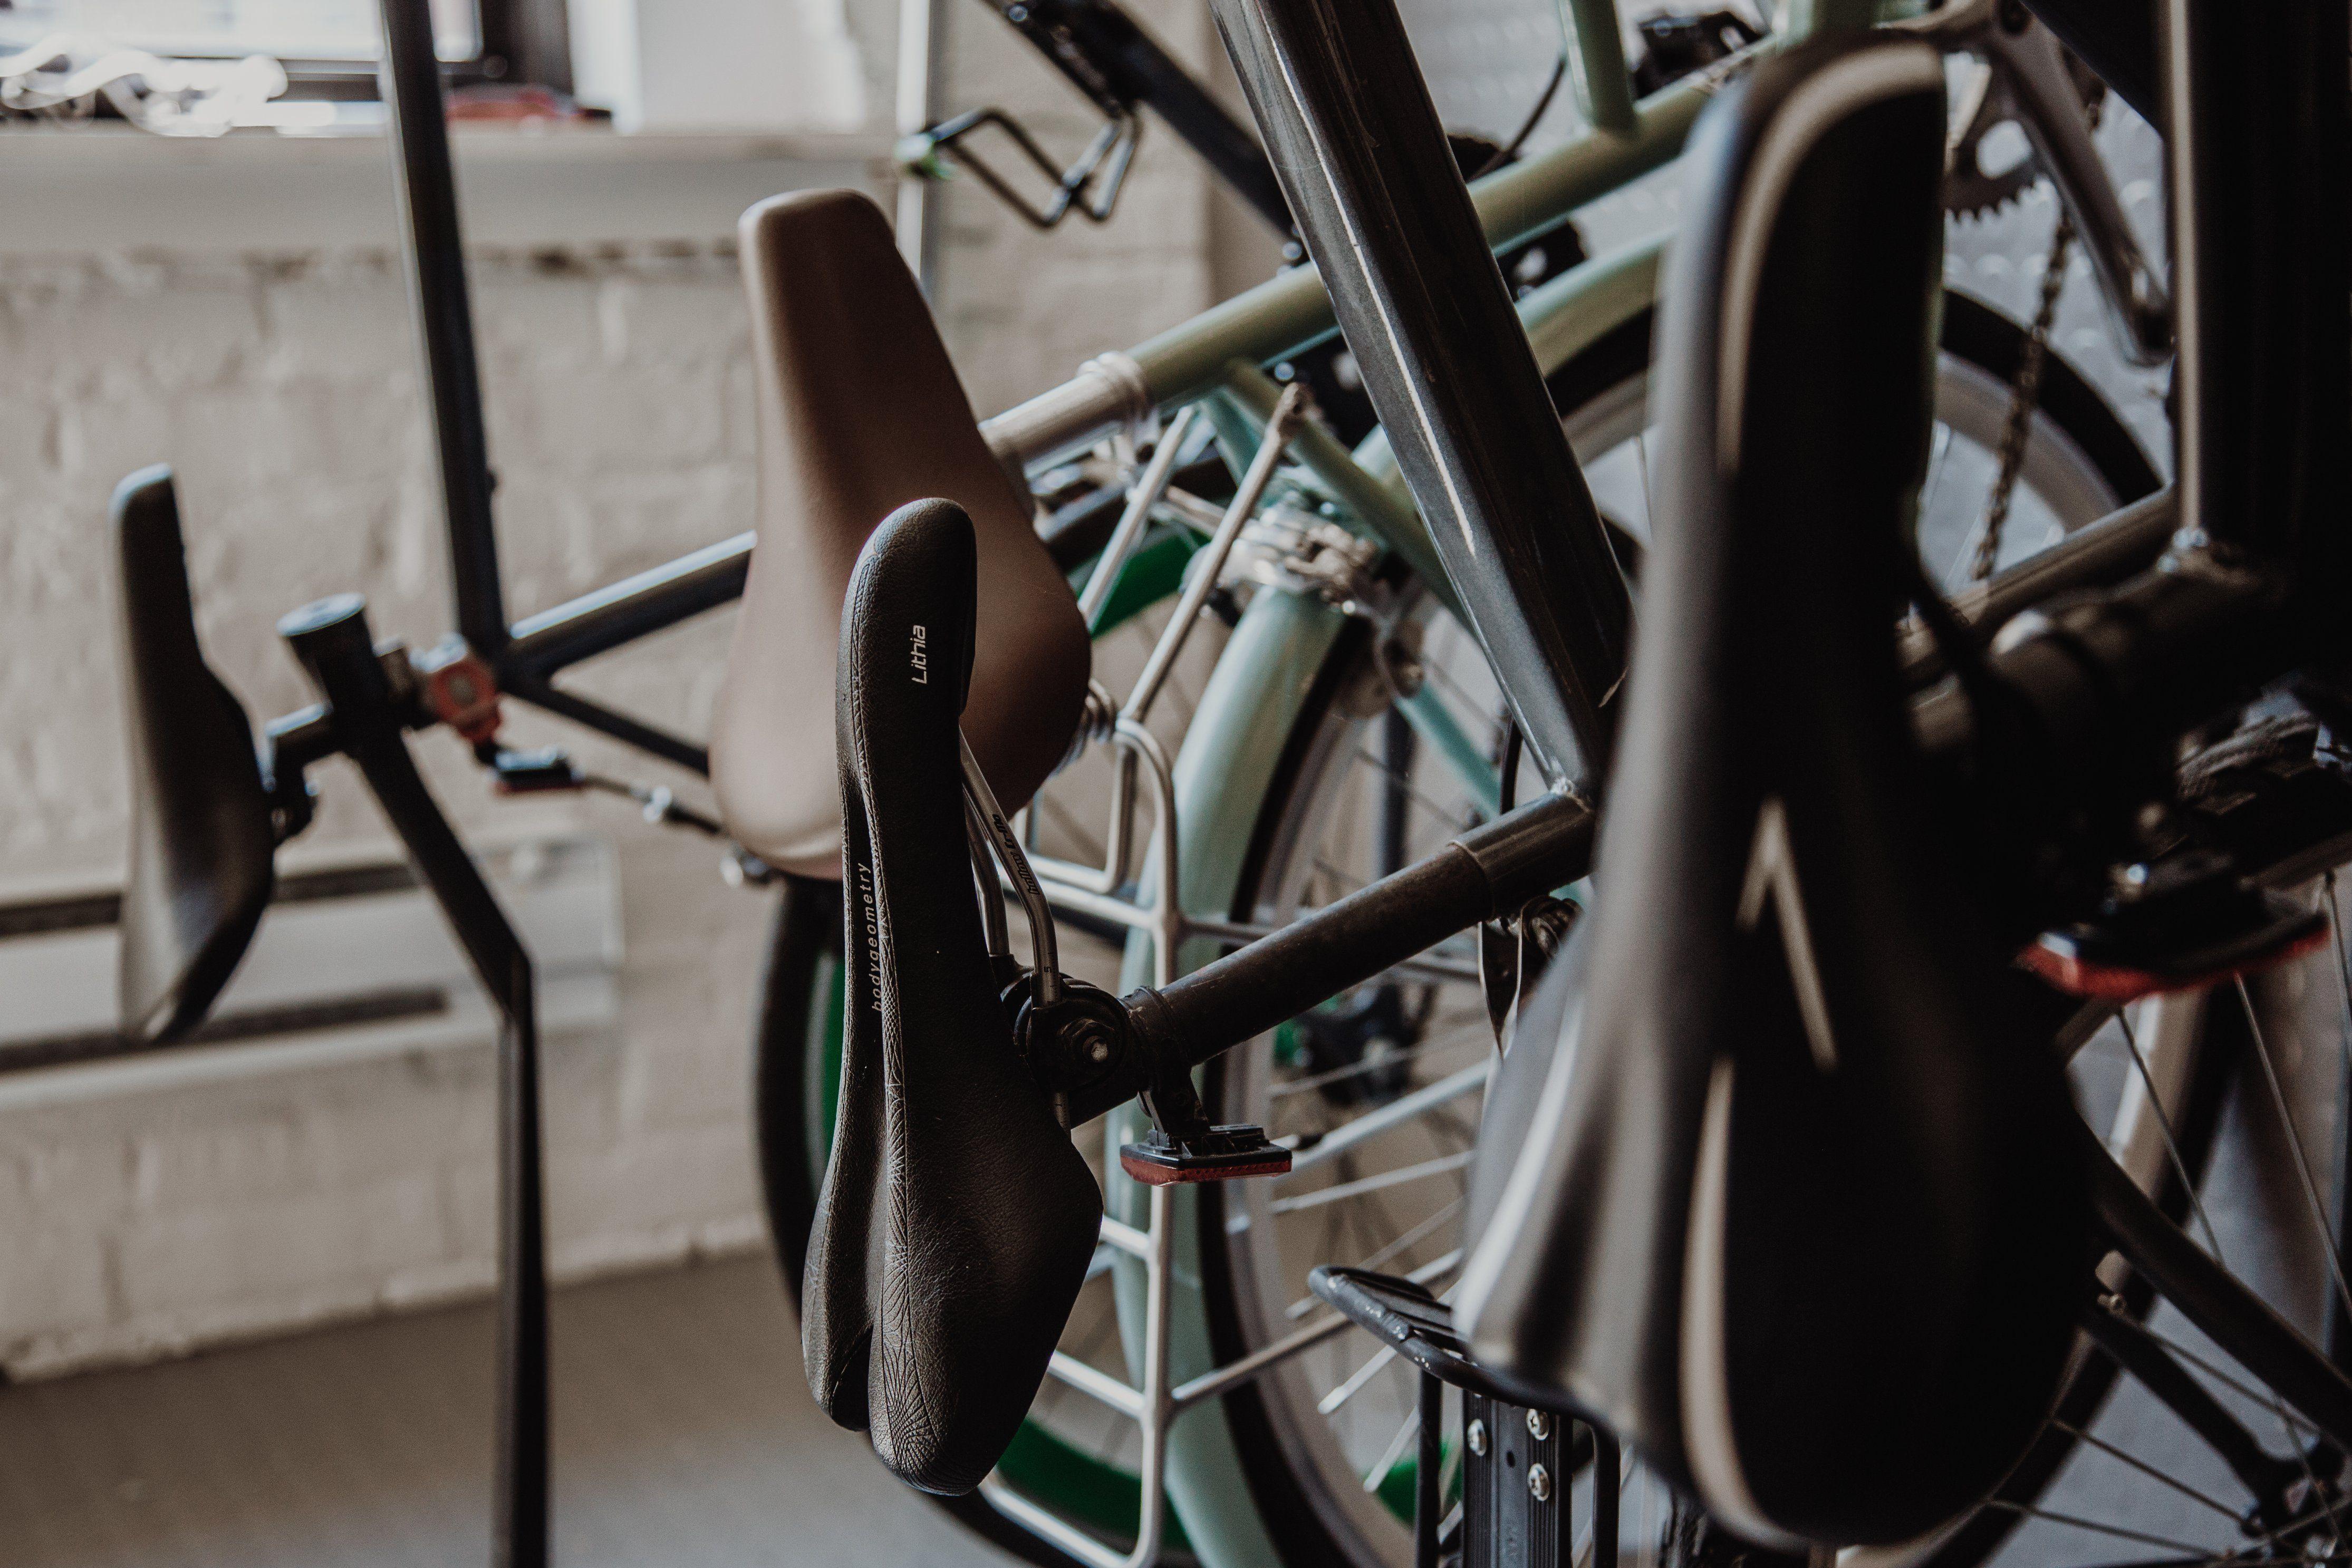 Top 10 Best Bike Racks For Garage Storage With Images Best